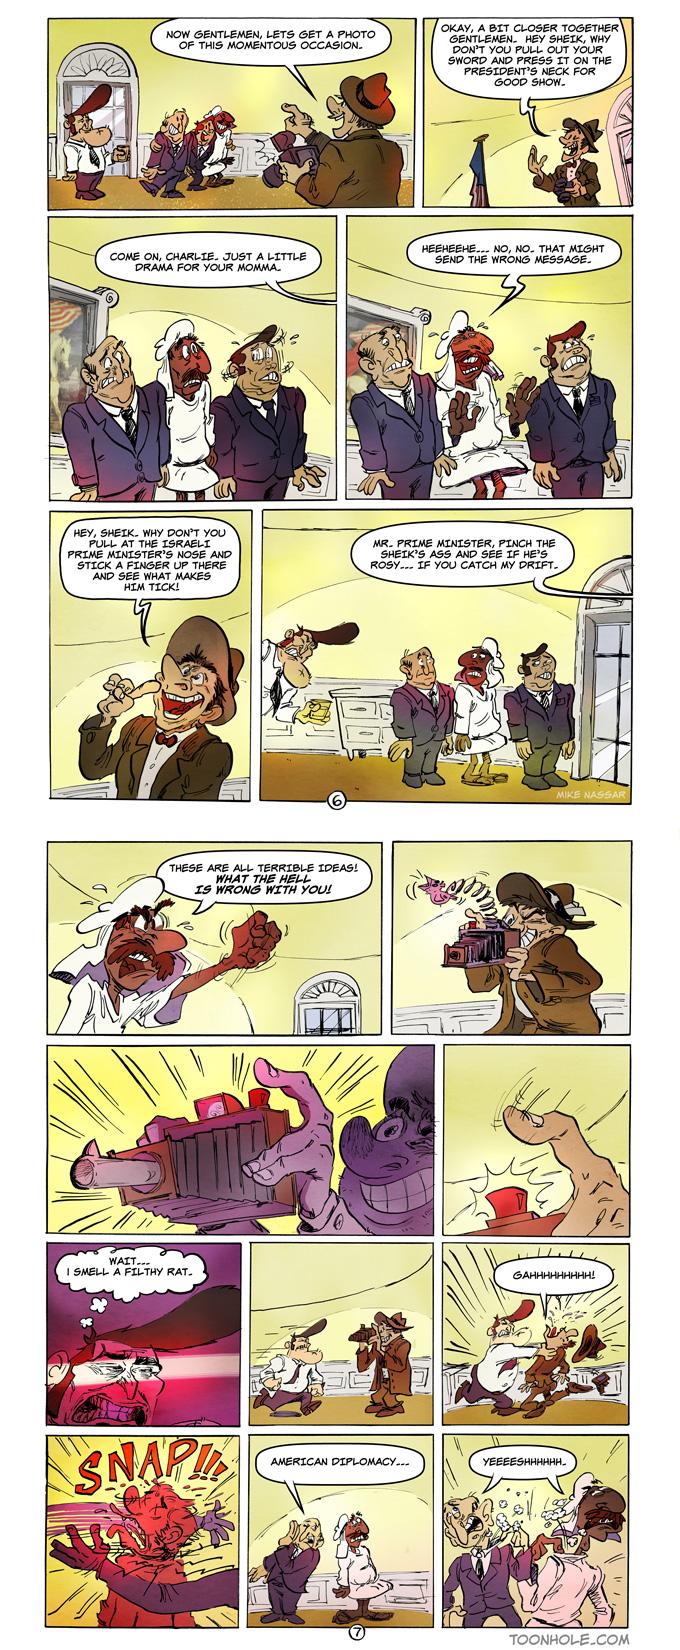 Dallas T. Washington – Pages 6-7